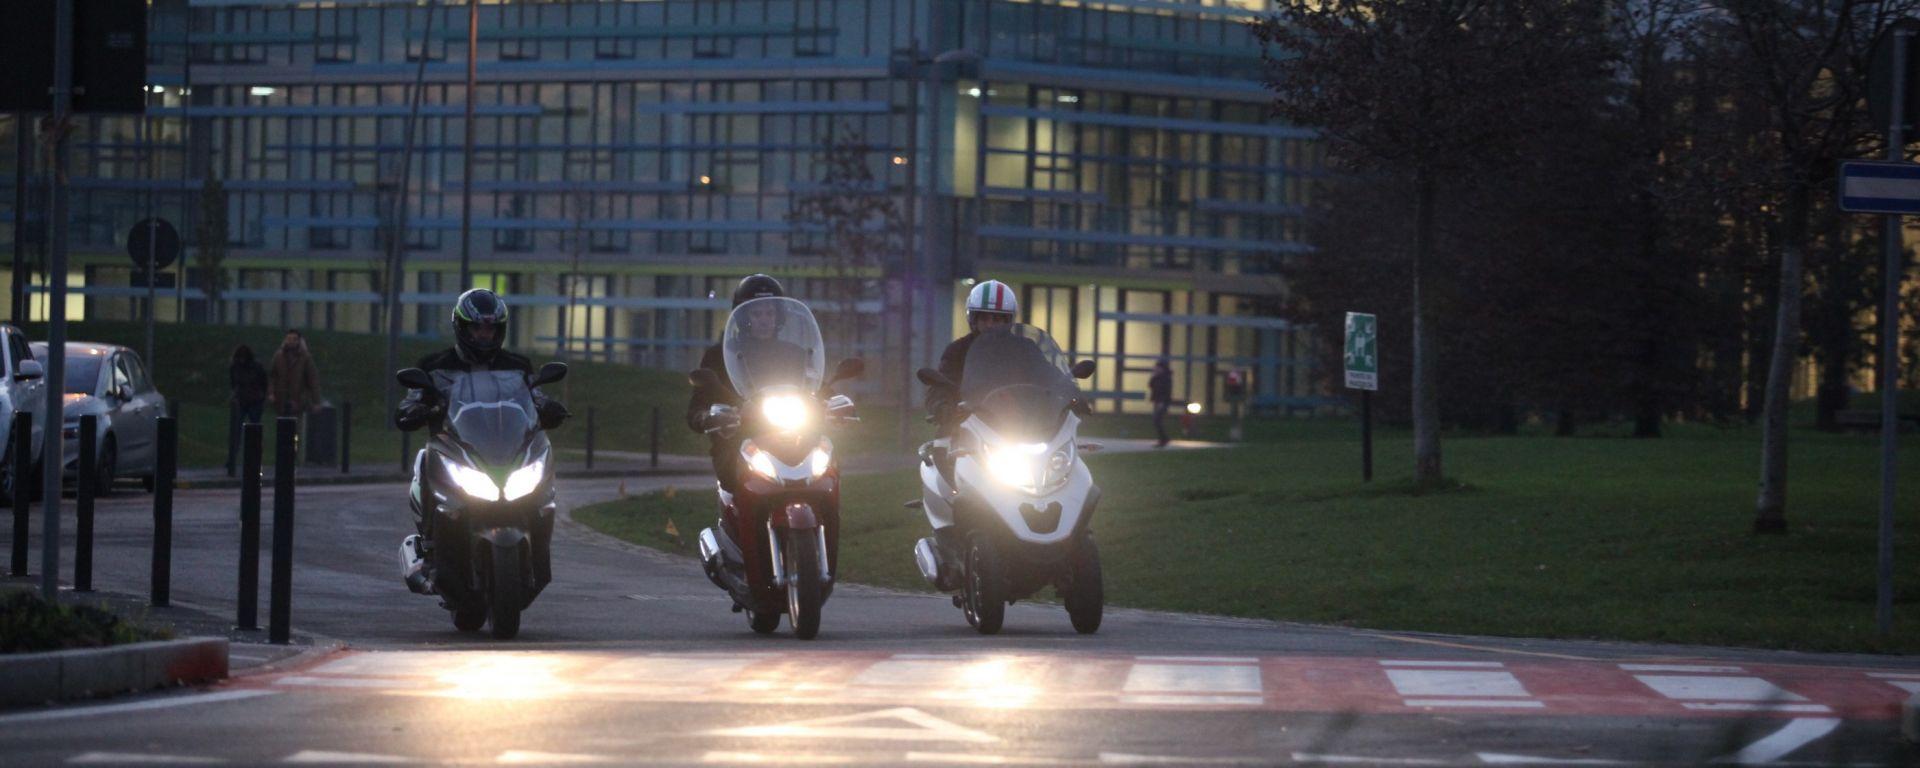 Piaggio Mp3 300 vs Kawasaki J300 vs Honda SH300i ABS